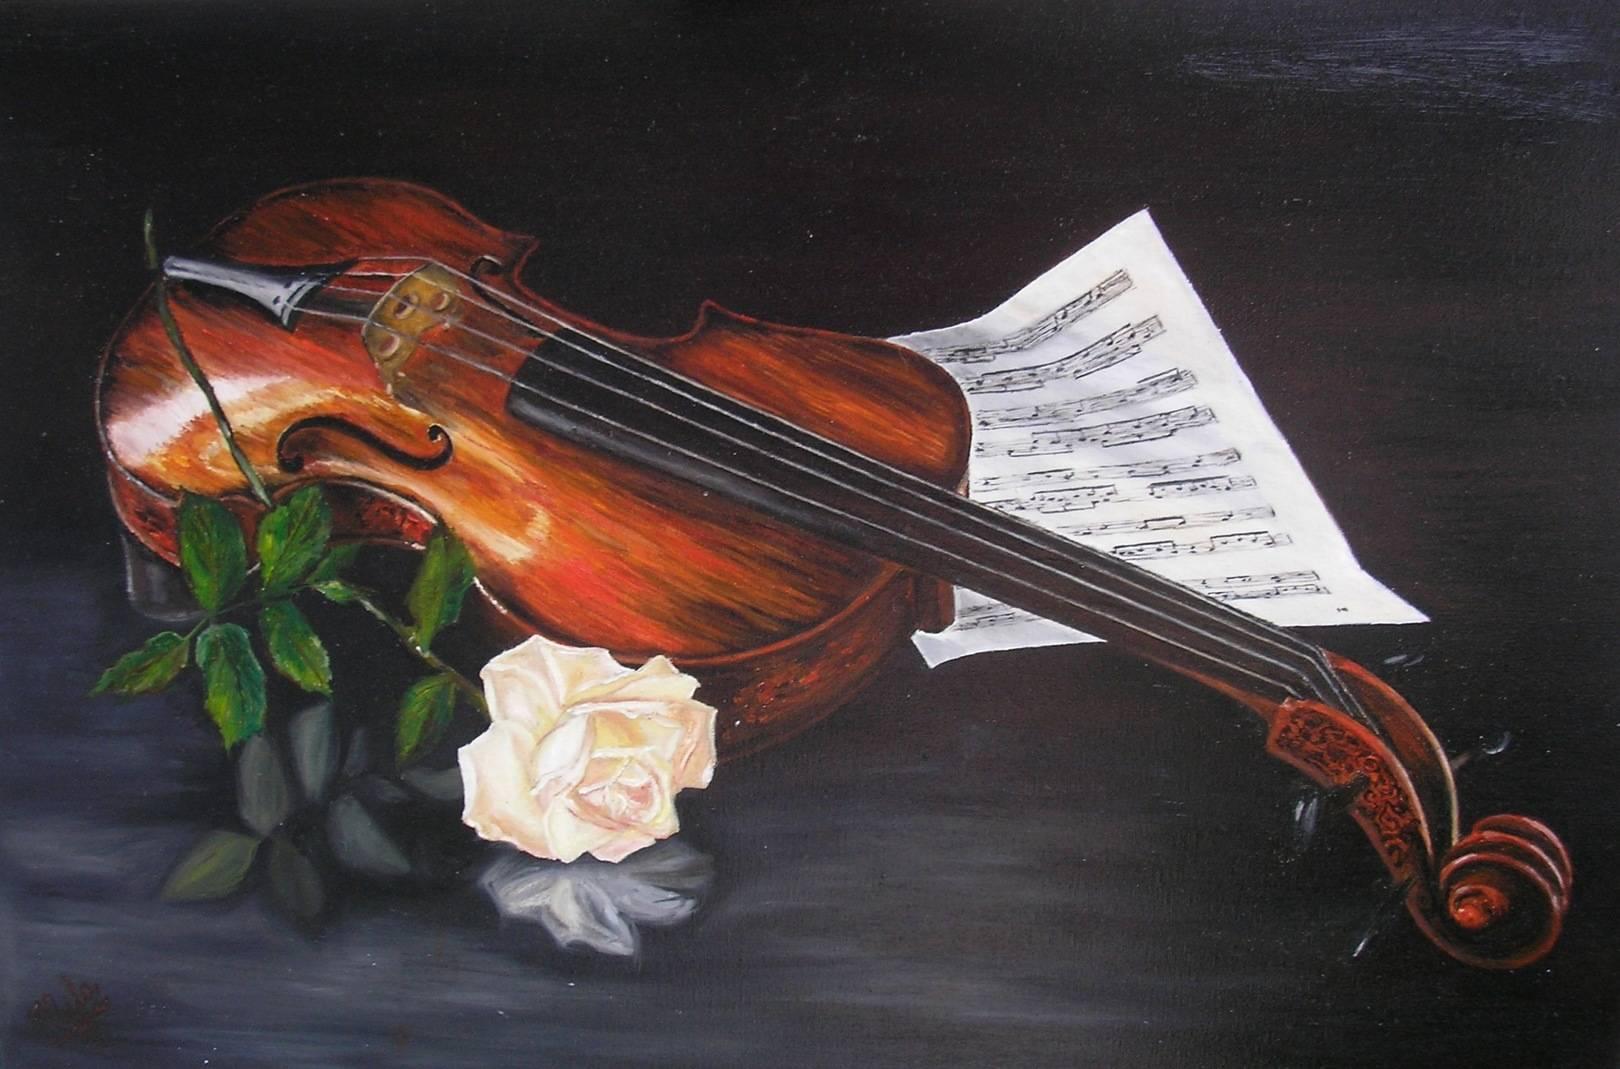 Влюбленный скрипачViolinist in loveх/мoil on canvas40х60